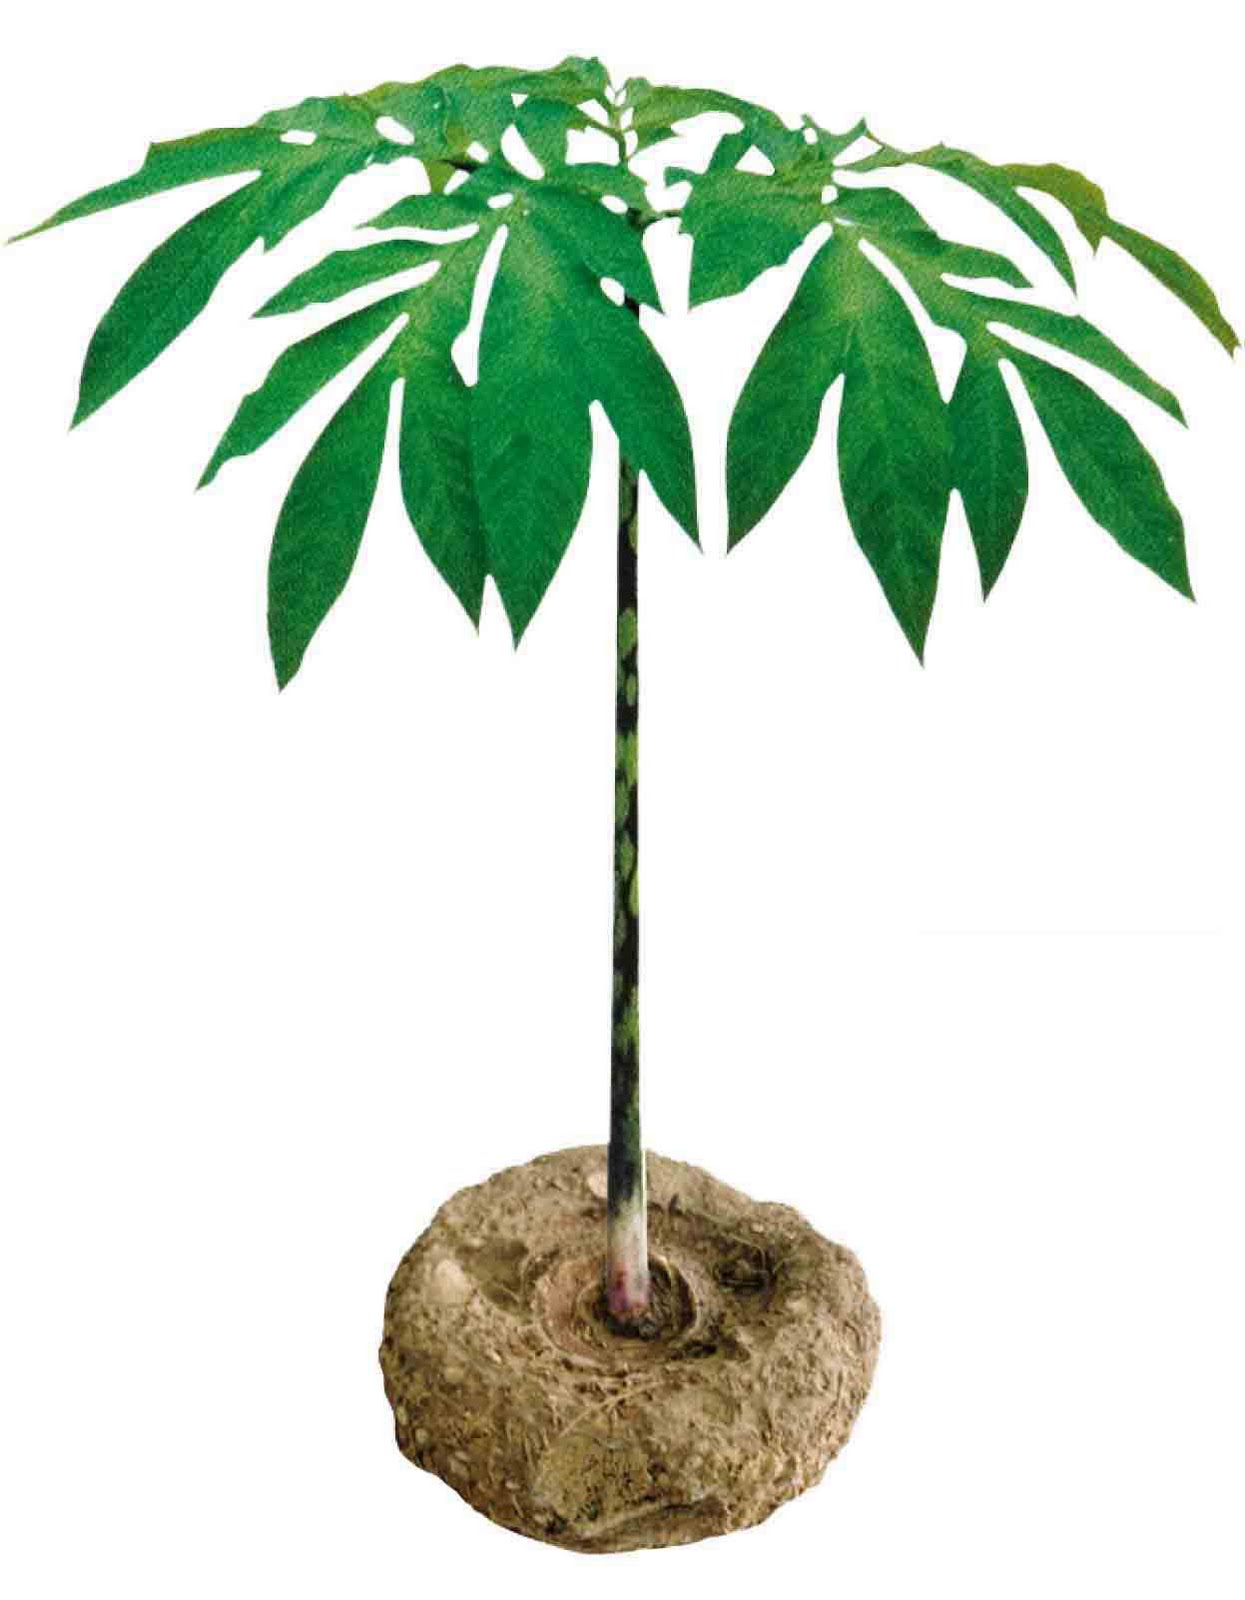 Amorphophallus Konjac Plant